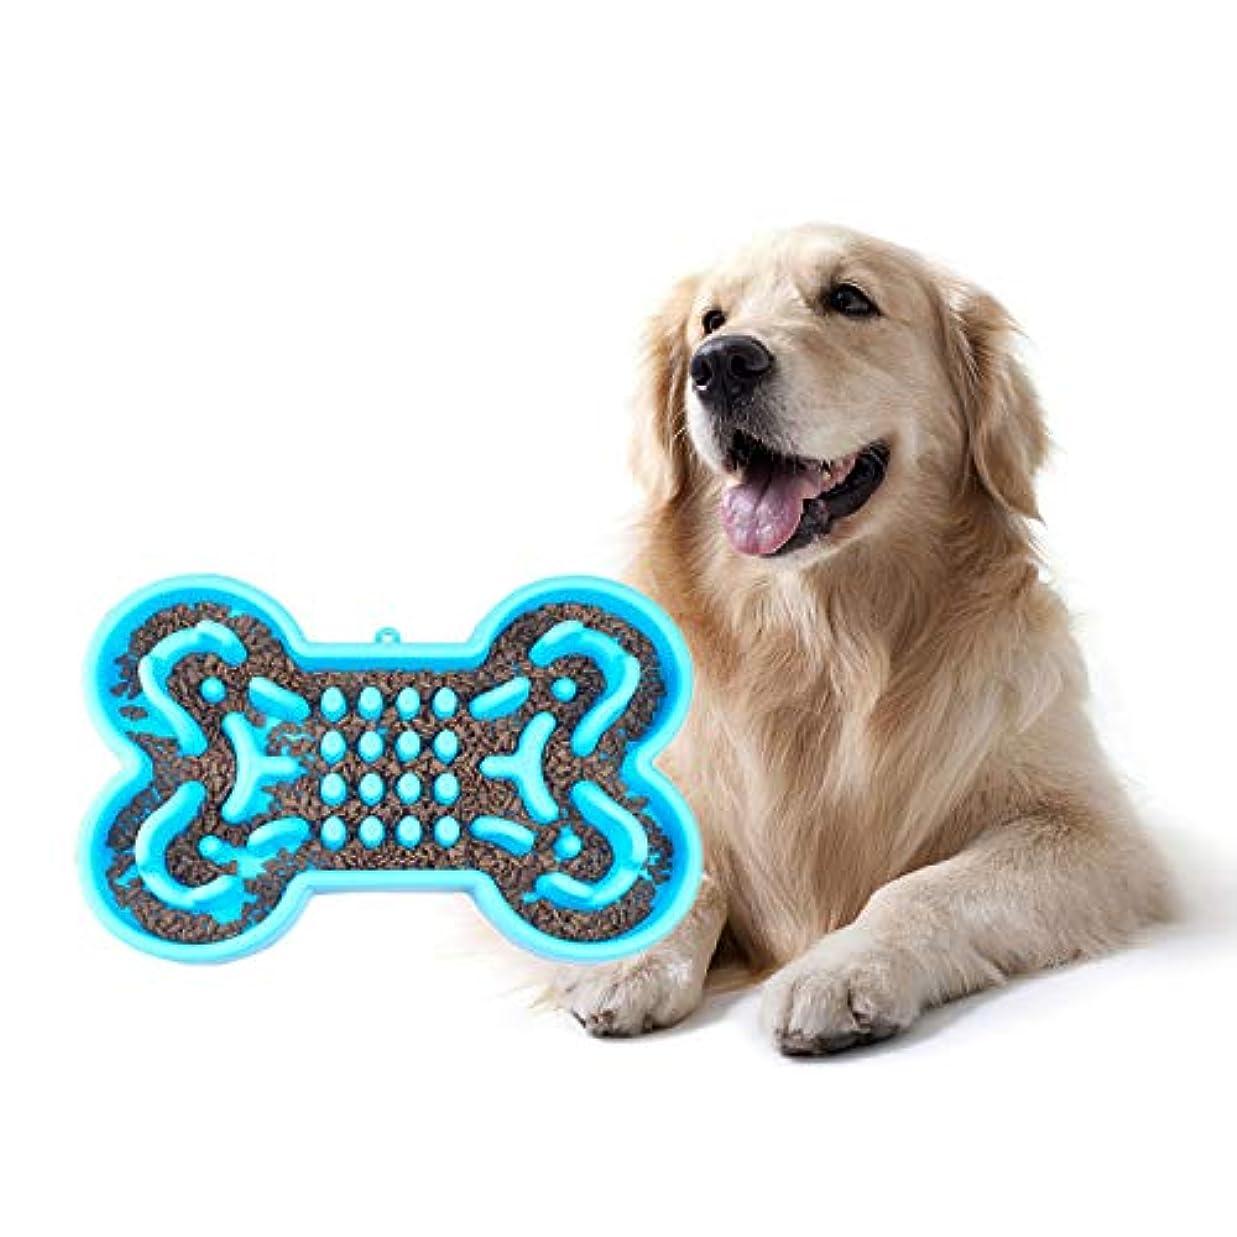 SHEENREAL 犬食器 犬用ボウル フード、餌入れ 早食い防止 骨型 皿 ゆっくり食べられる 小、中型犬向き 滑り止め スローフード 犬用品